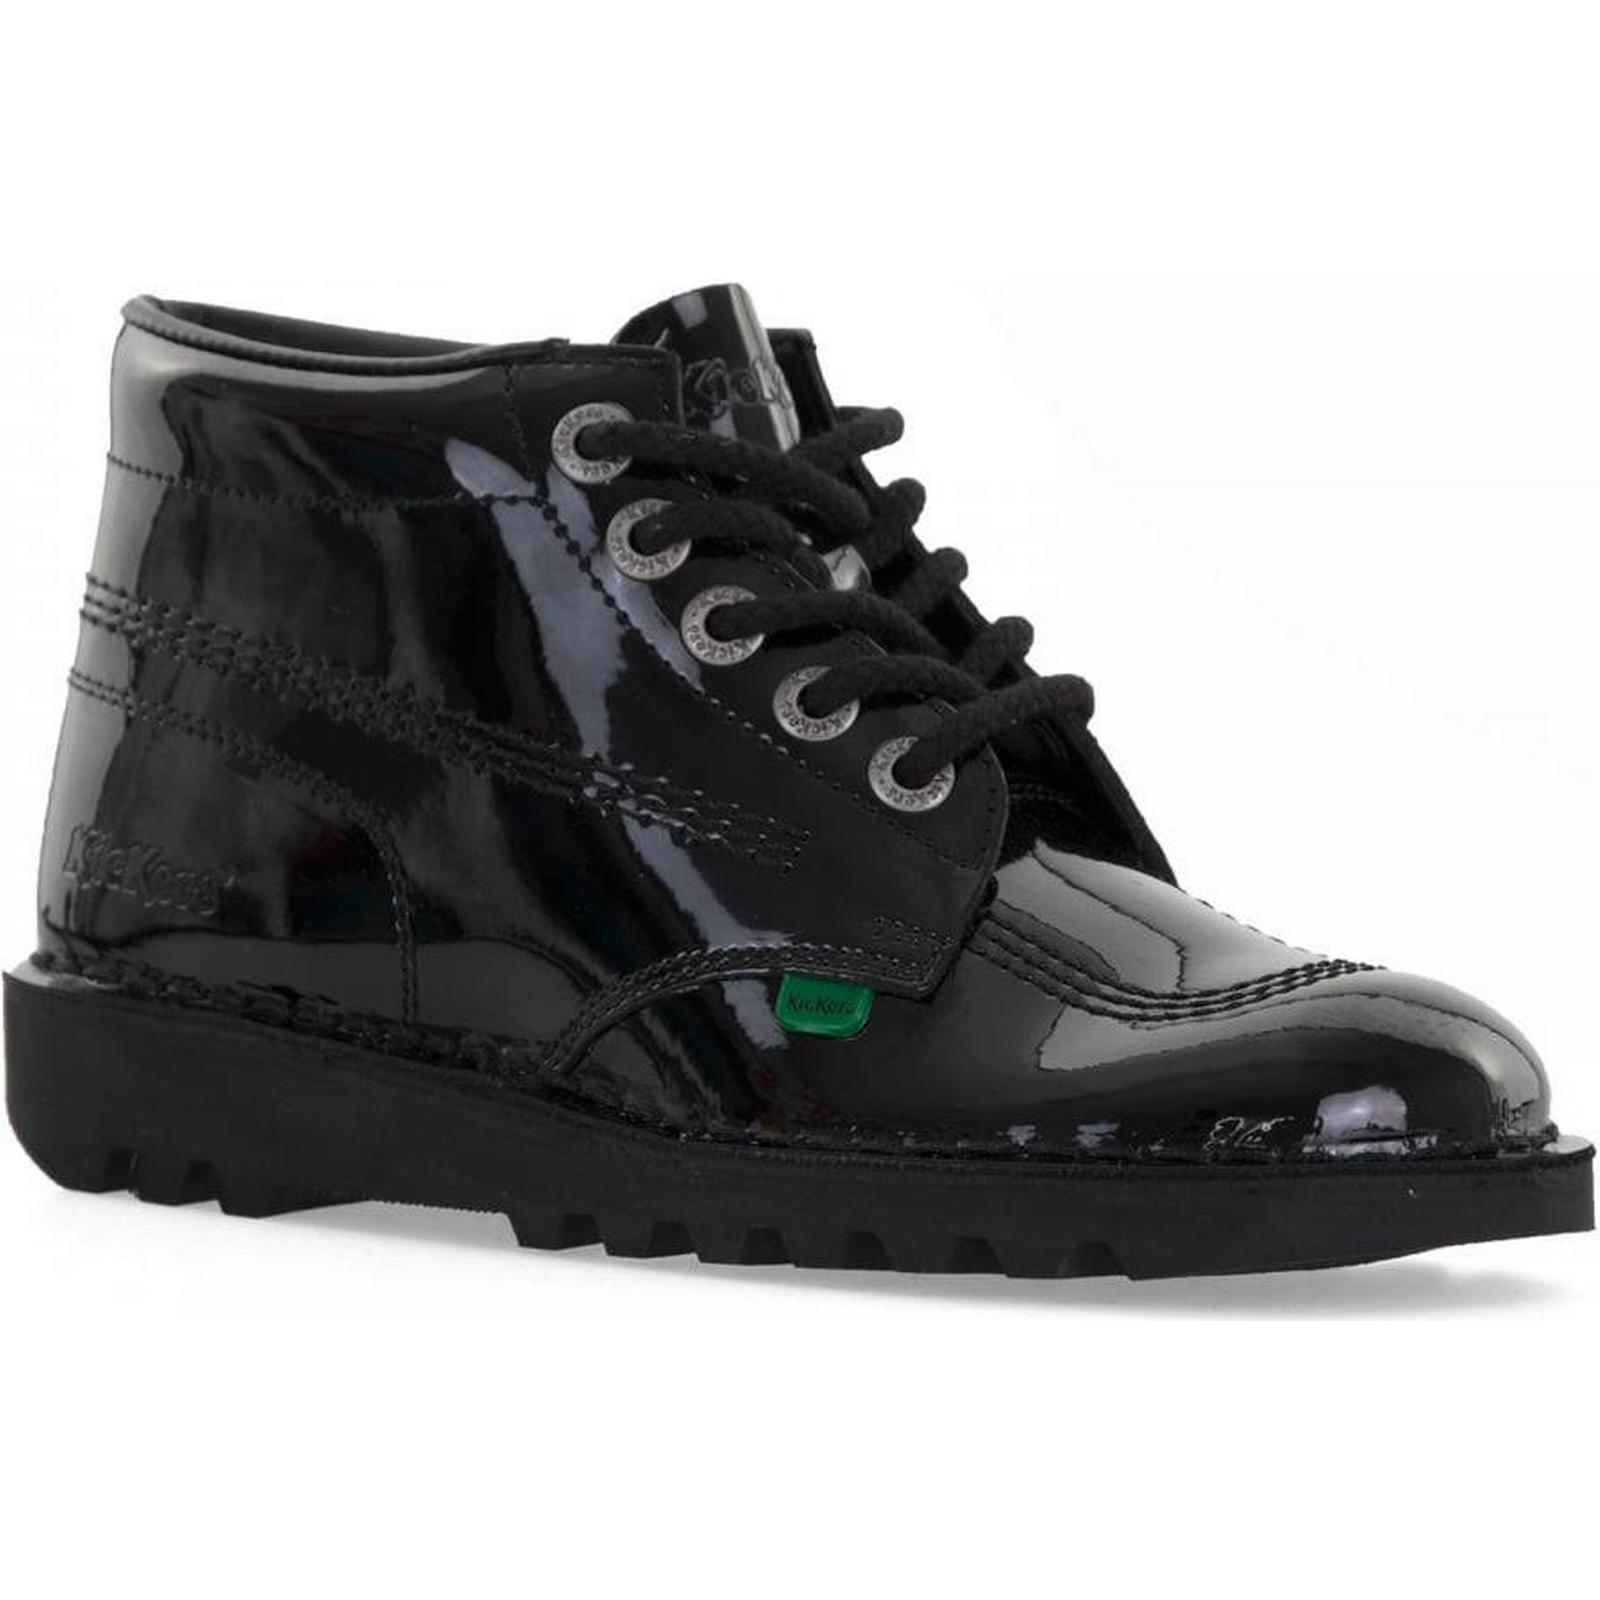 Kickers Womens (Black) Kick Hi Patent Boots (Black) Womens Size: 8, Colour: BLACK a47826